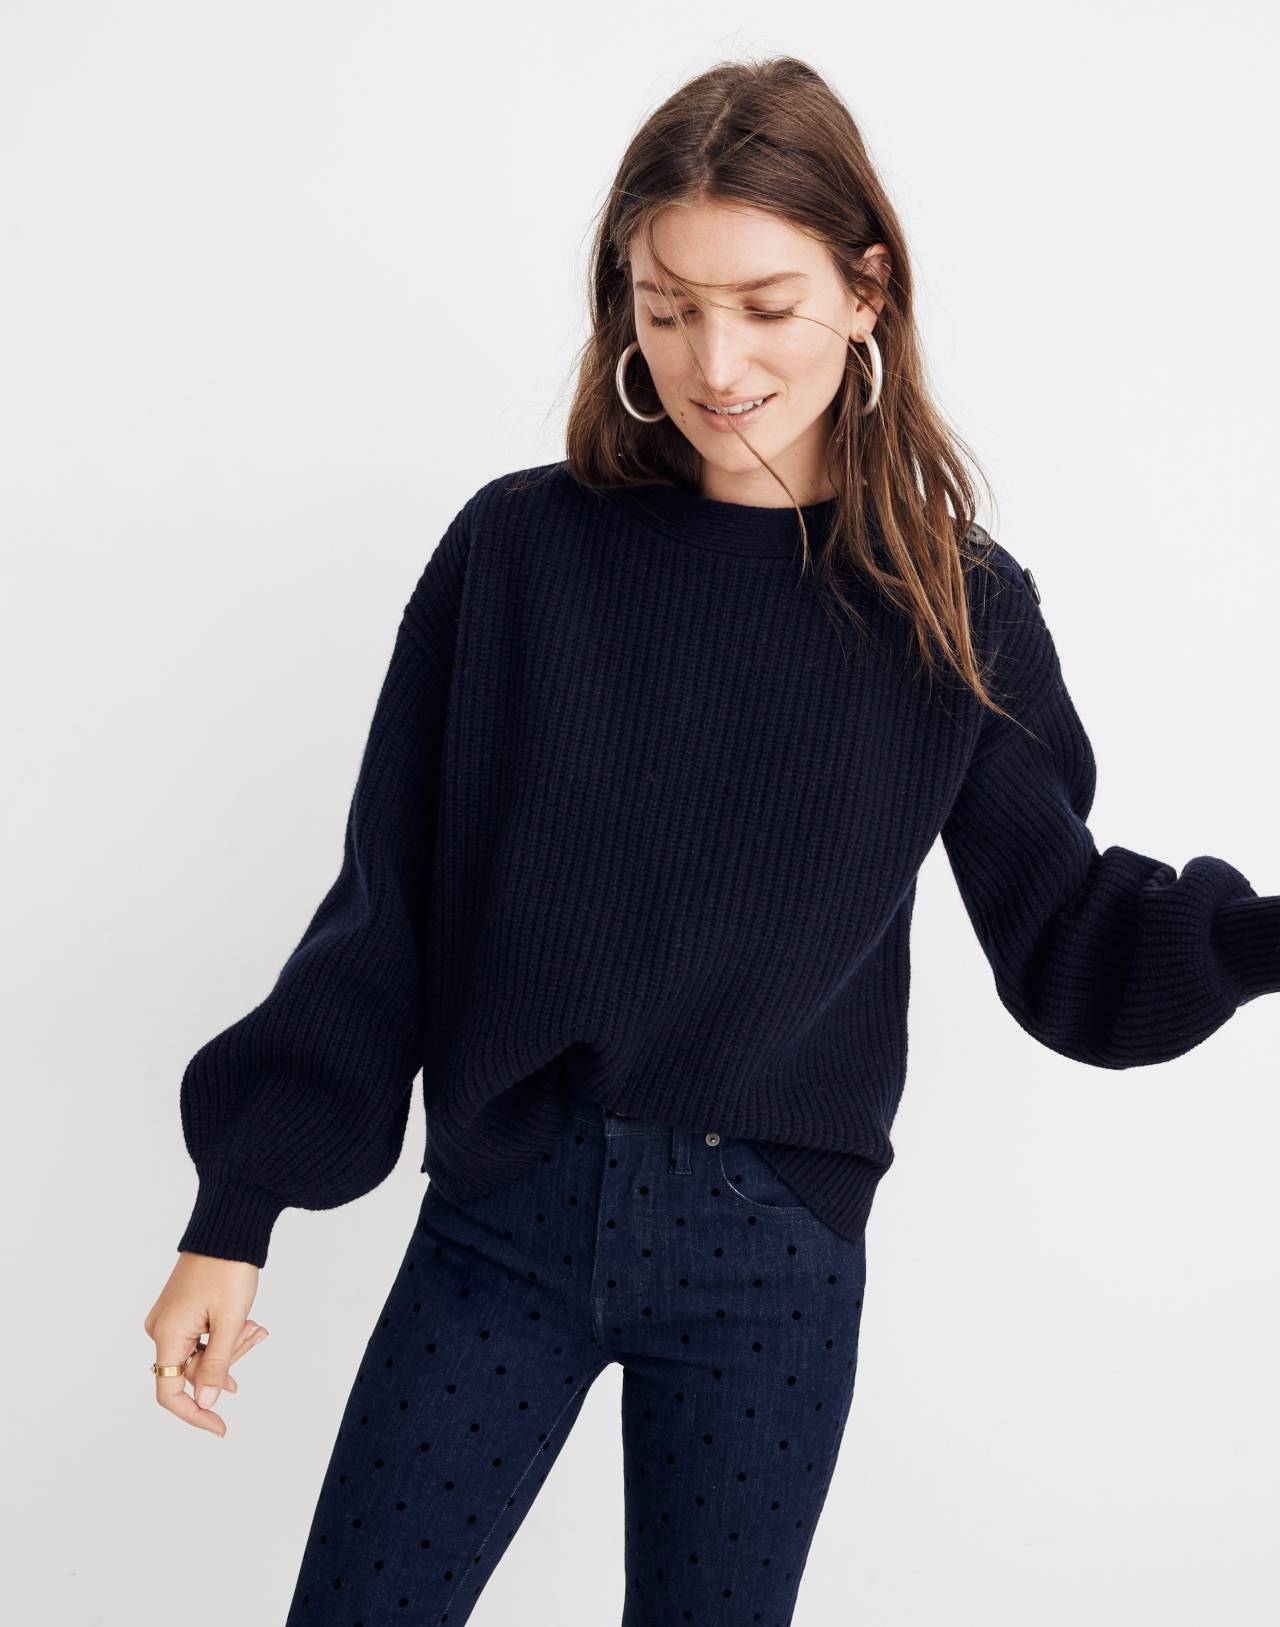 Boatneck Button-Shoulder Sweater in navy image 1